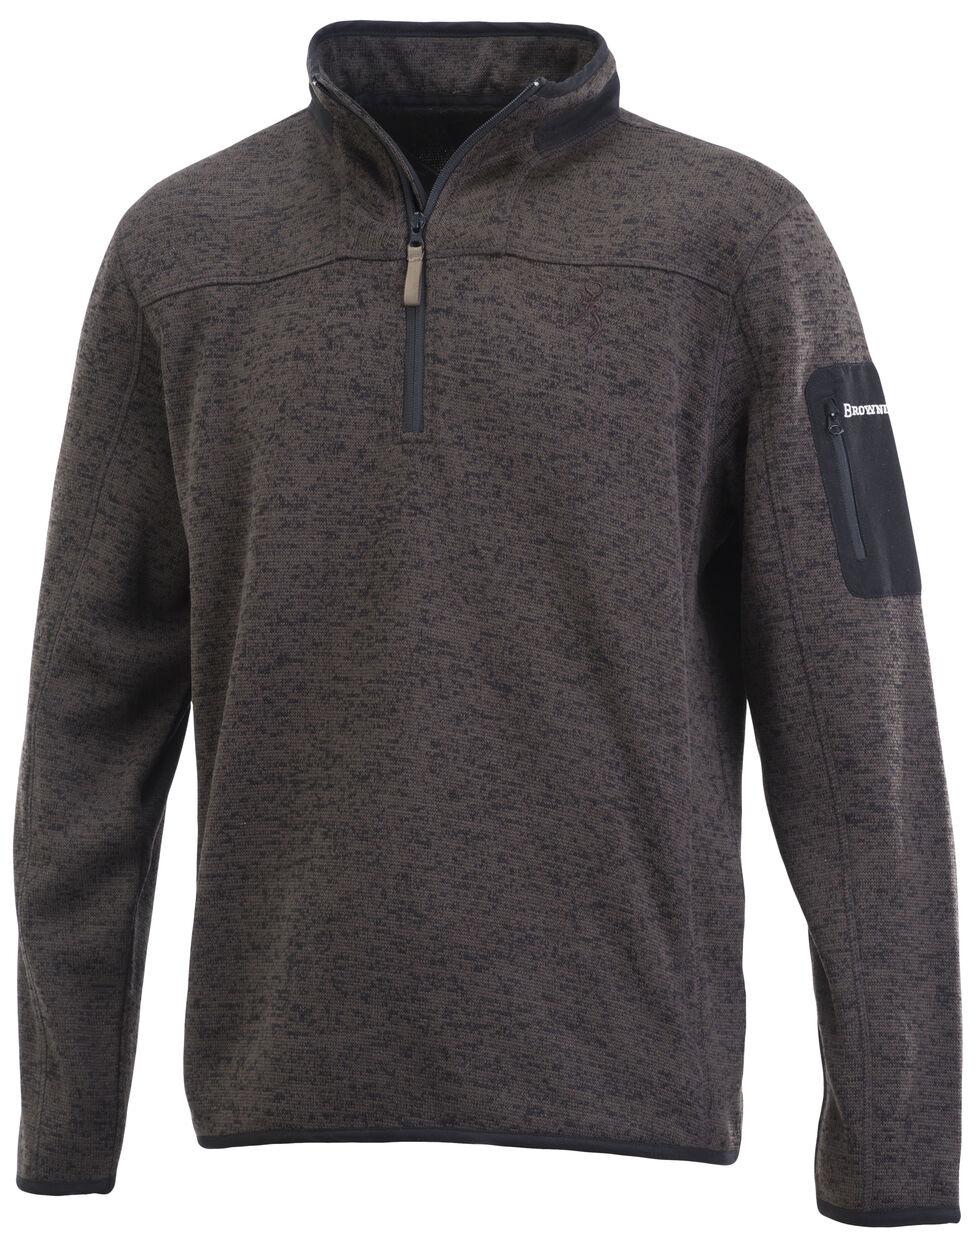 Browning Men's Black Laredo Sweater Pullover, Black, hi-res